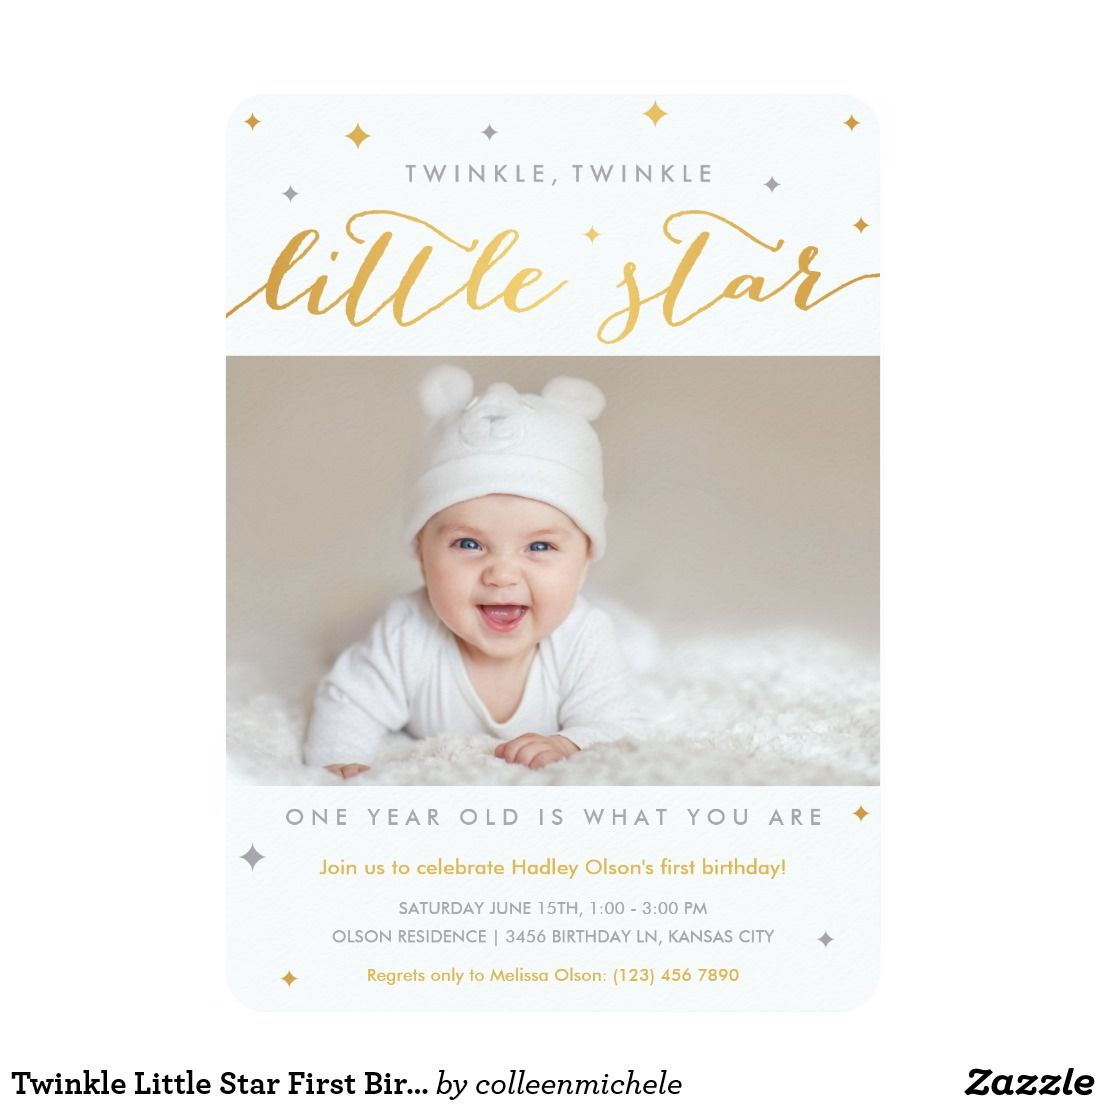 Twinkle Little Star First Birthday Invitations | Twinkle twinkle ...